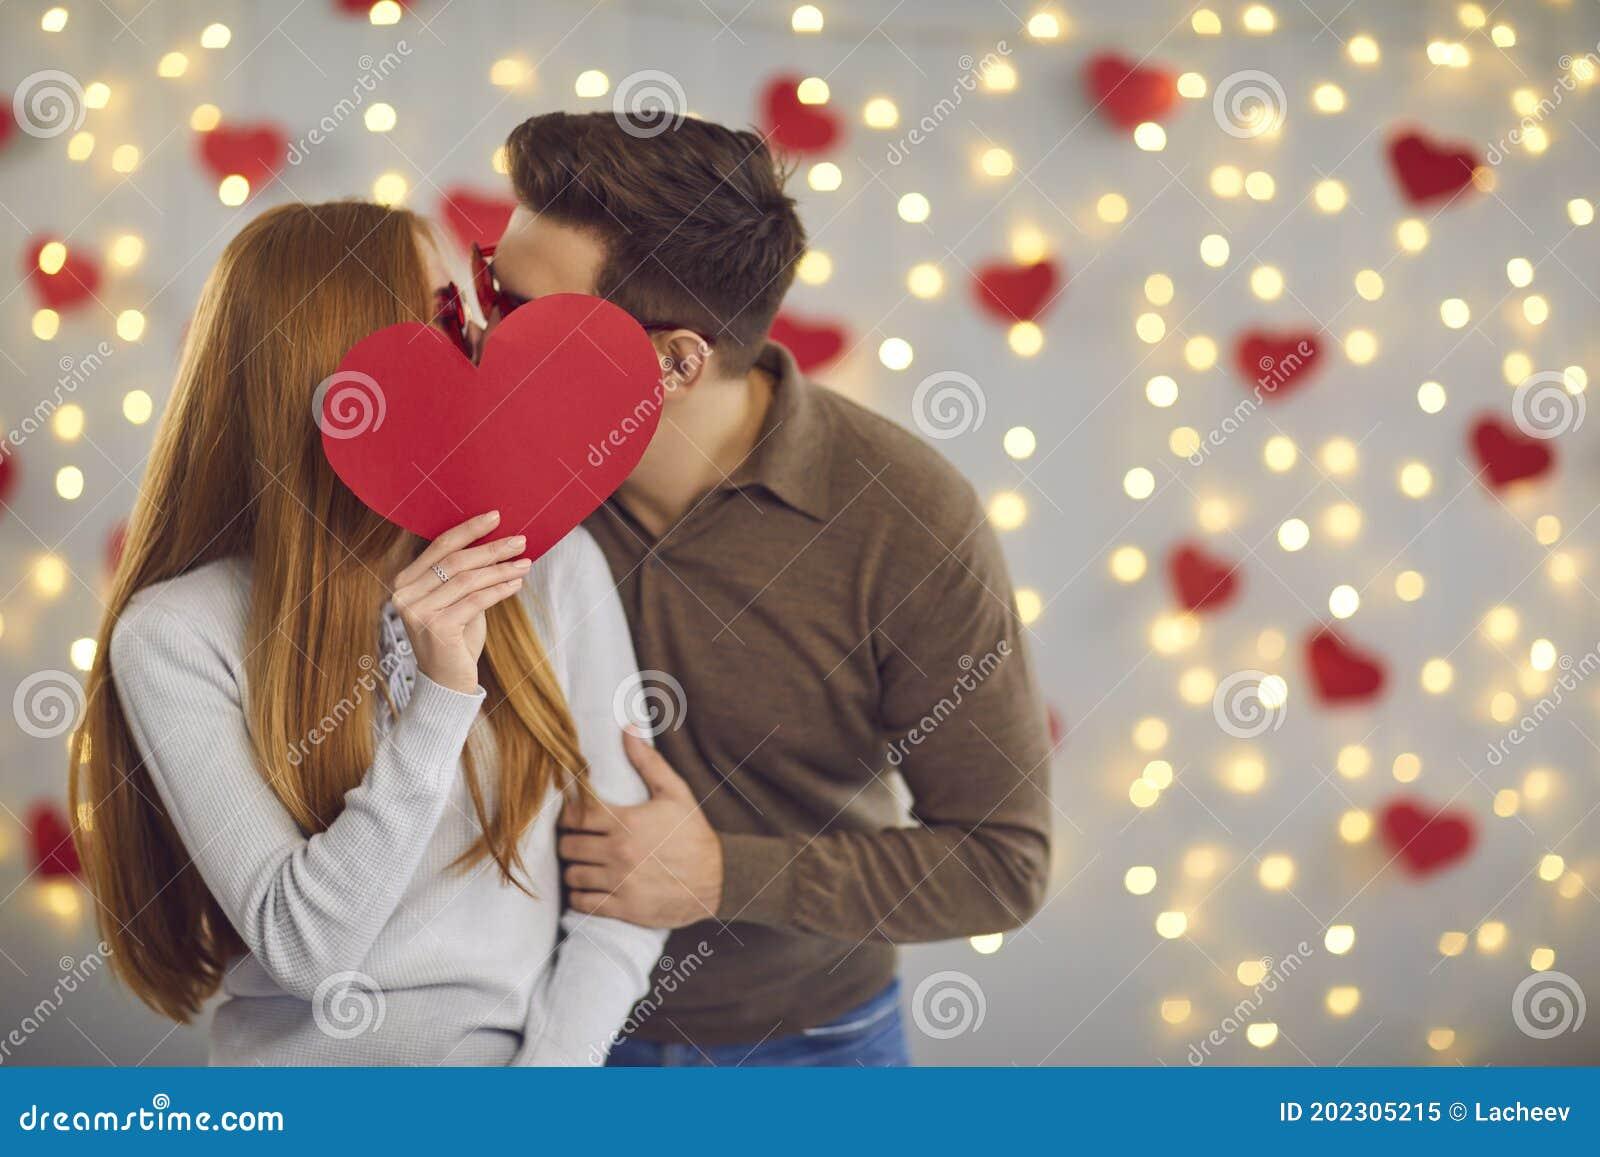 Big Kisses Dating Site